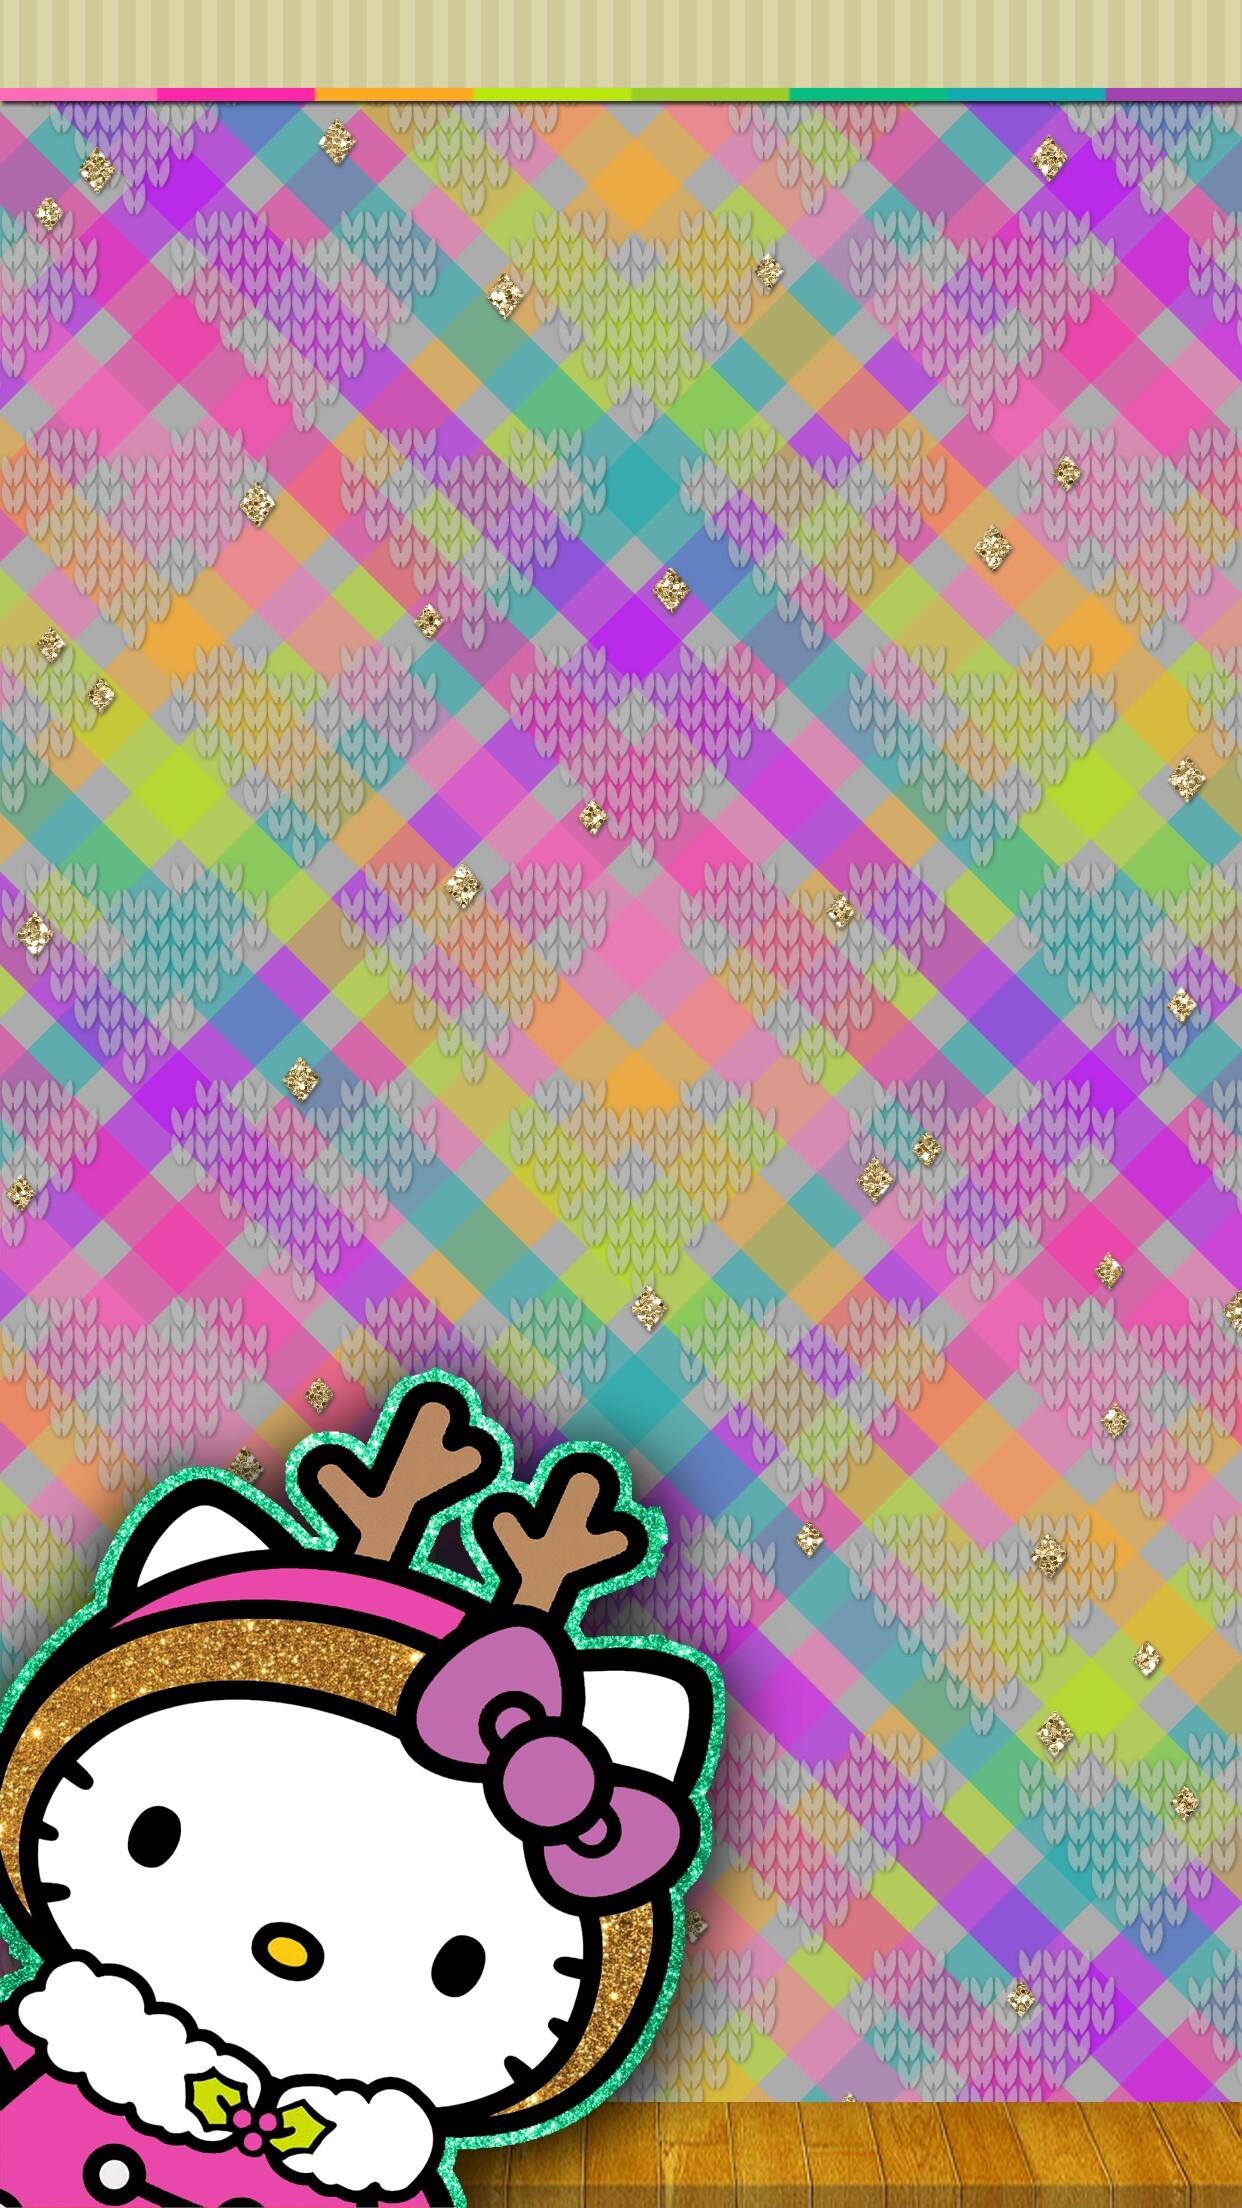 Hello Kitty Wallpaper, Christmas Wallpaper, Walls, Phone Wallpapers,  Sanrio, Kawaii, Xmas, Screen, Wallpaper